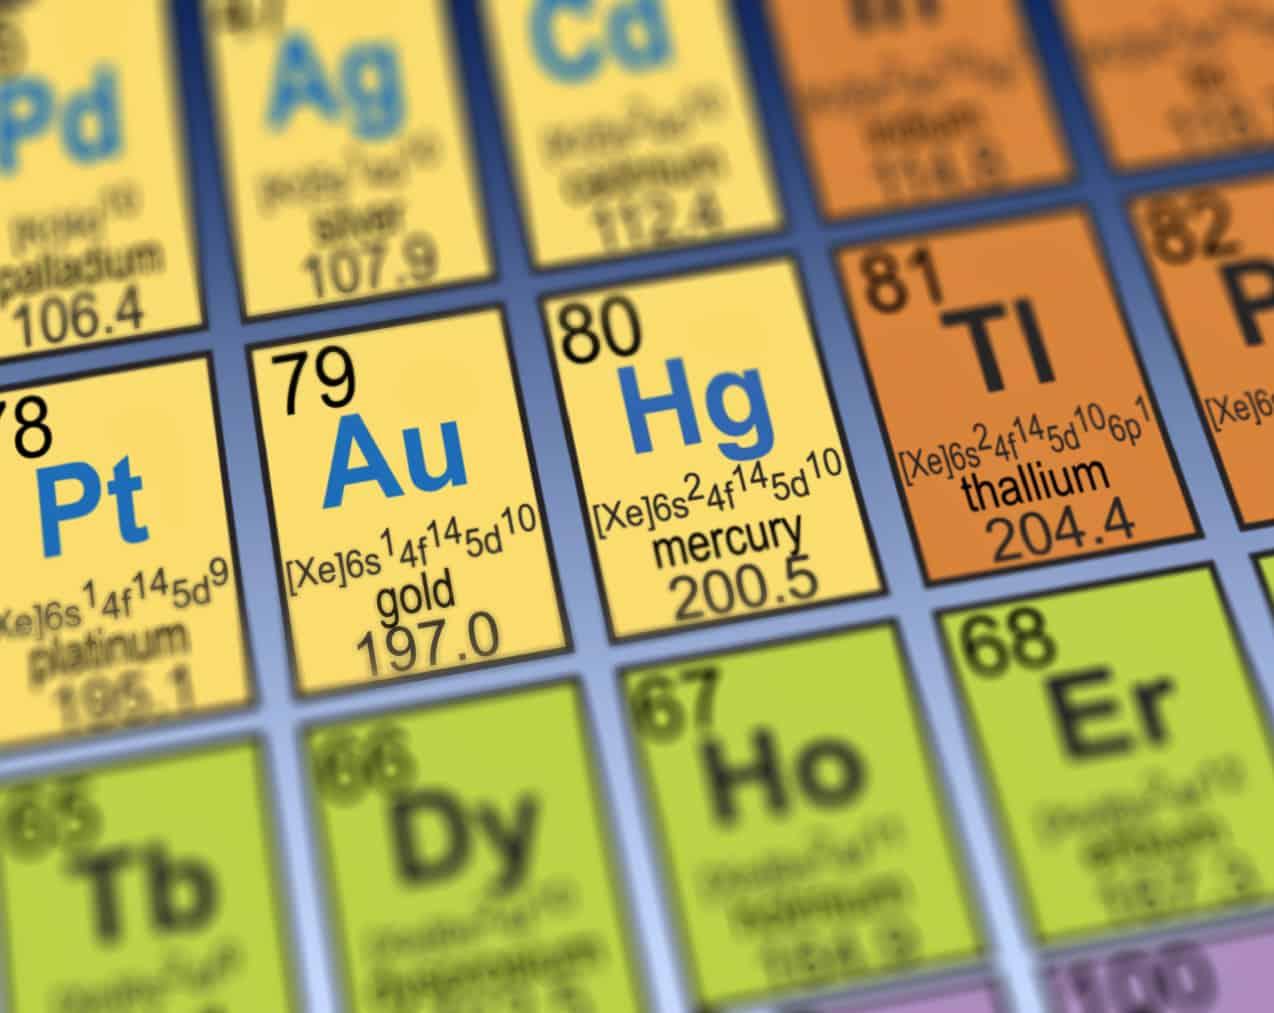 Heavy metal names in periodic table - NAET Dubai